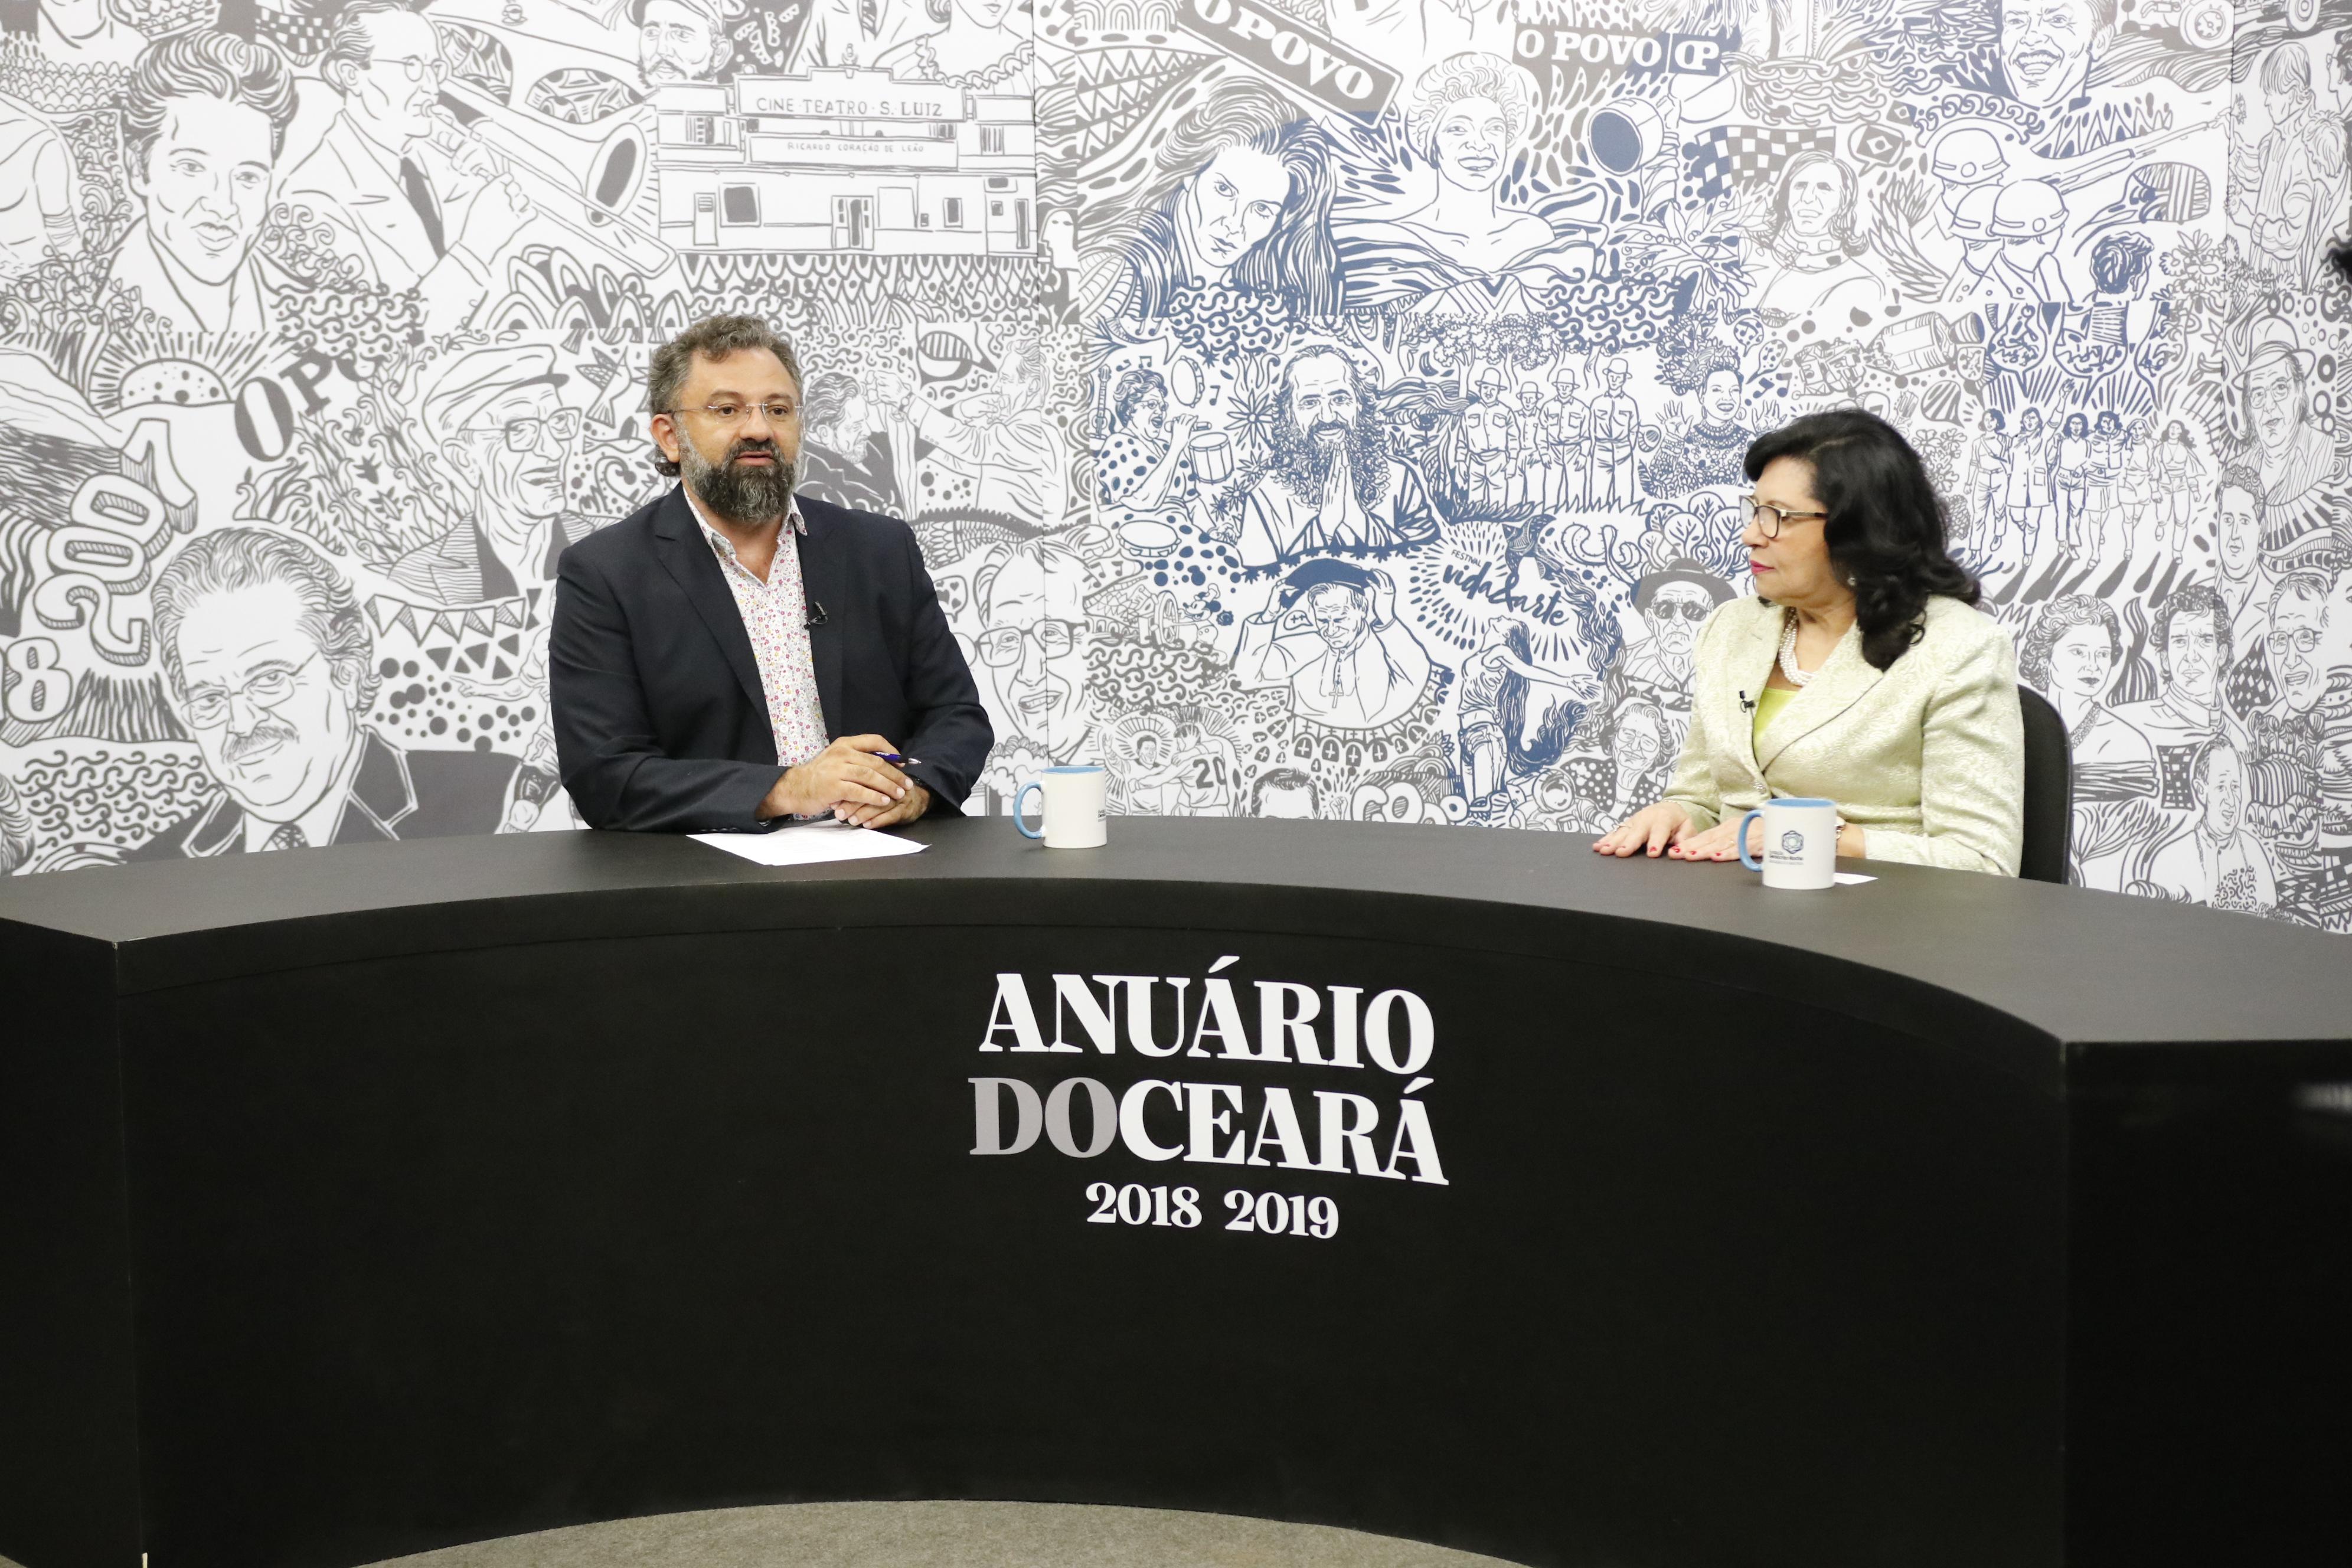 Jocélio Leal entrevista a desembargadora do TJCE, Maria Nailde Pinheiro, para o Especial Anuário do Ceará 2018-2019